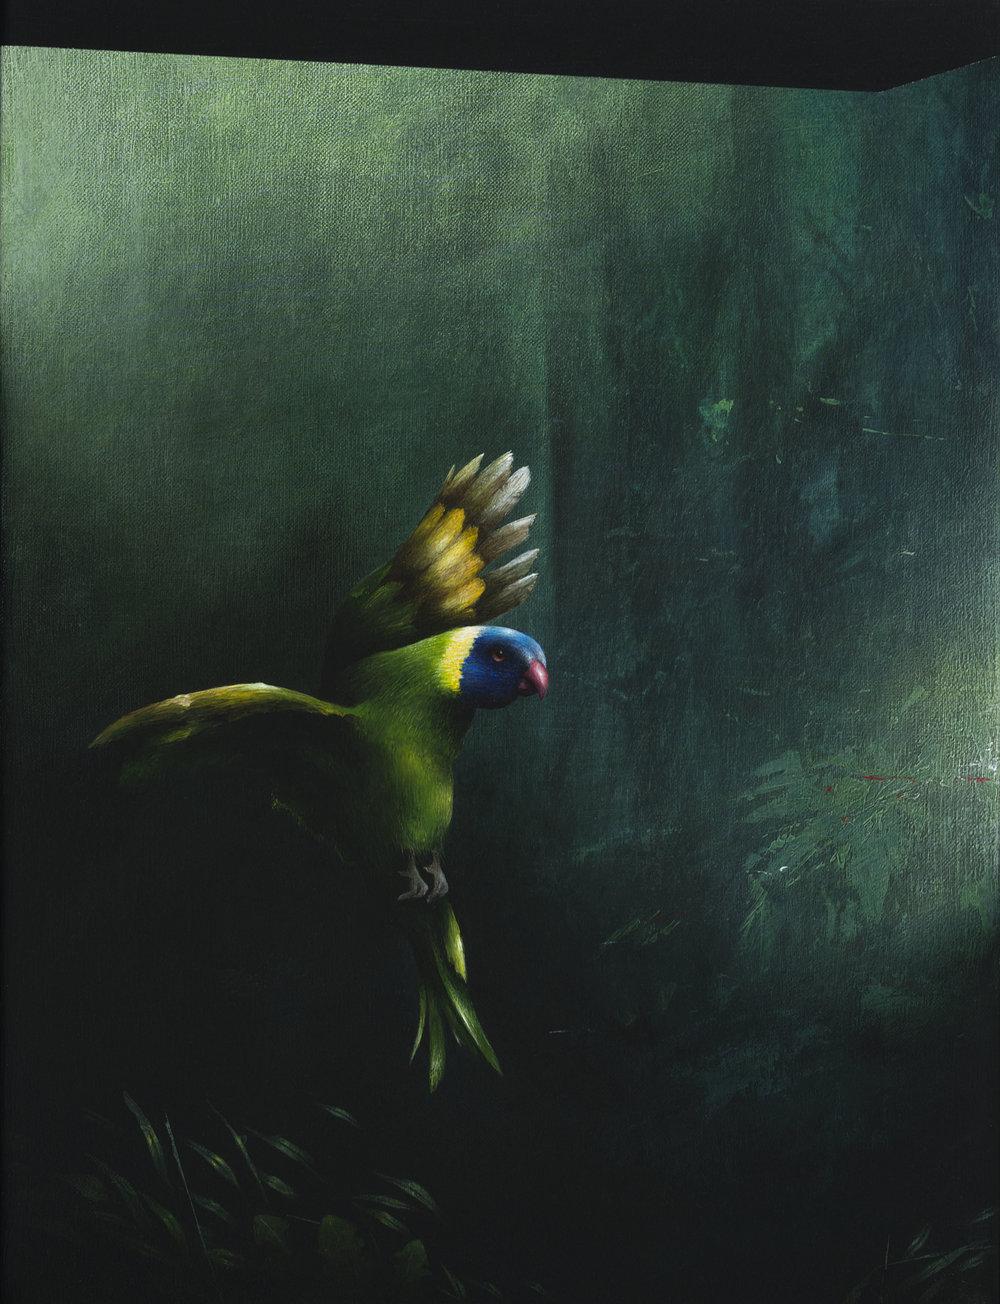 Jarek Wojcik, Presque Vu , 2016, Acrylic on linen, 41x31cm